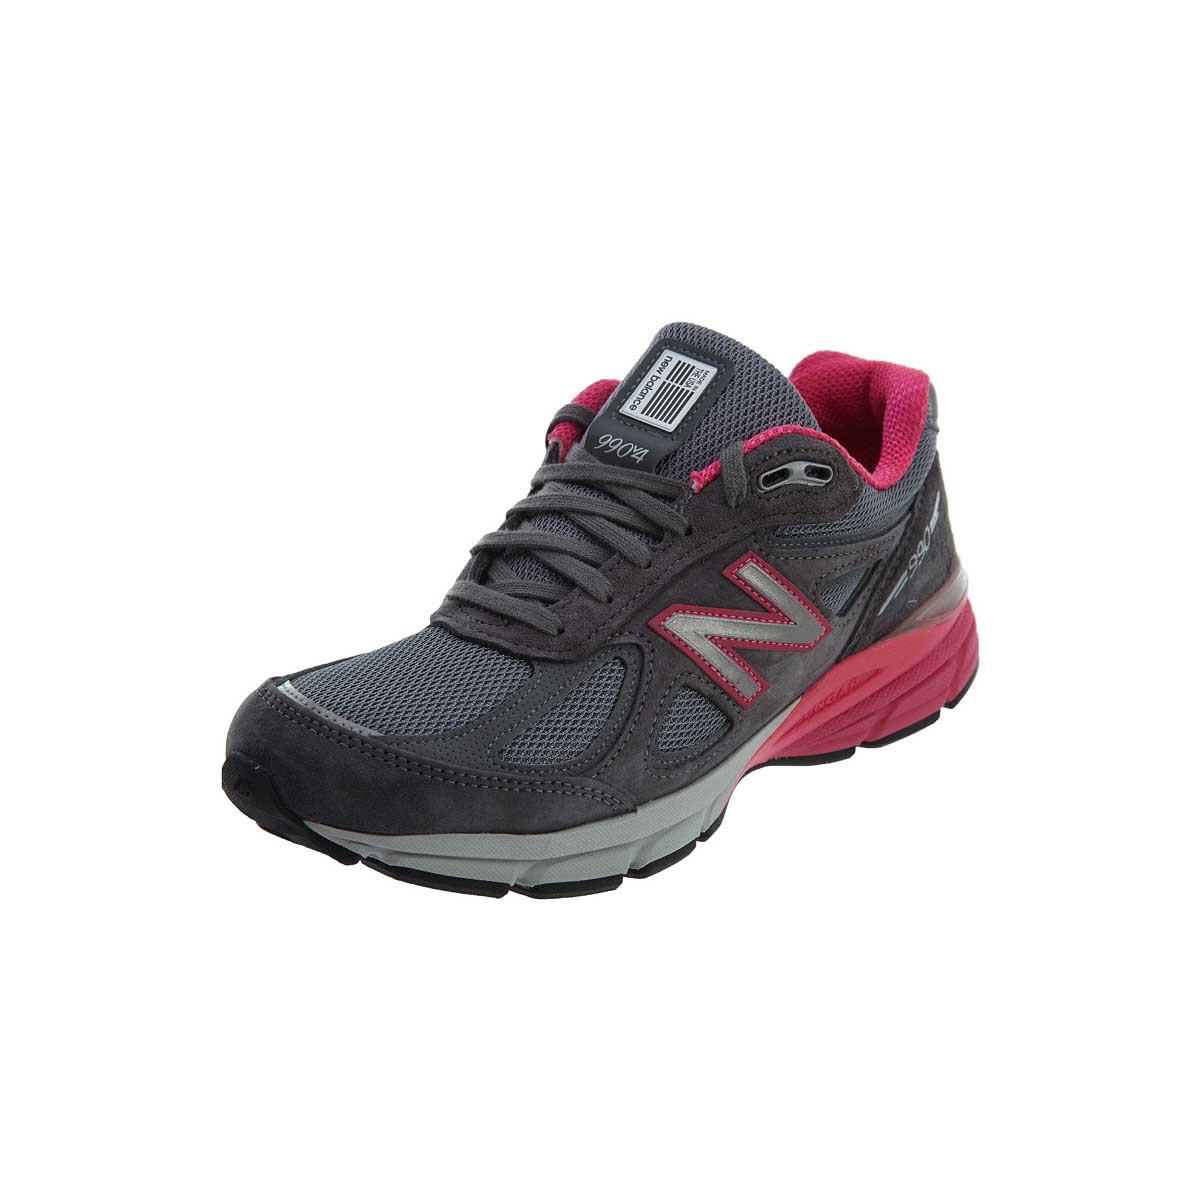 new style 584ad 05ad1 New BalanceRunning Course W990 女款运动复古鞋W990GP4_唯品会